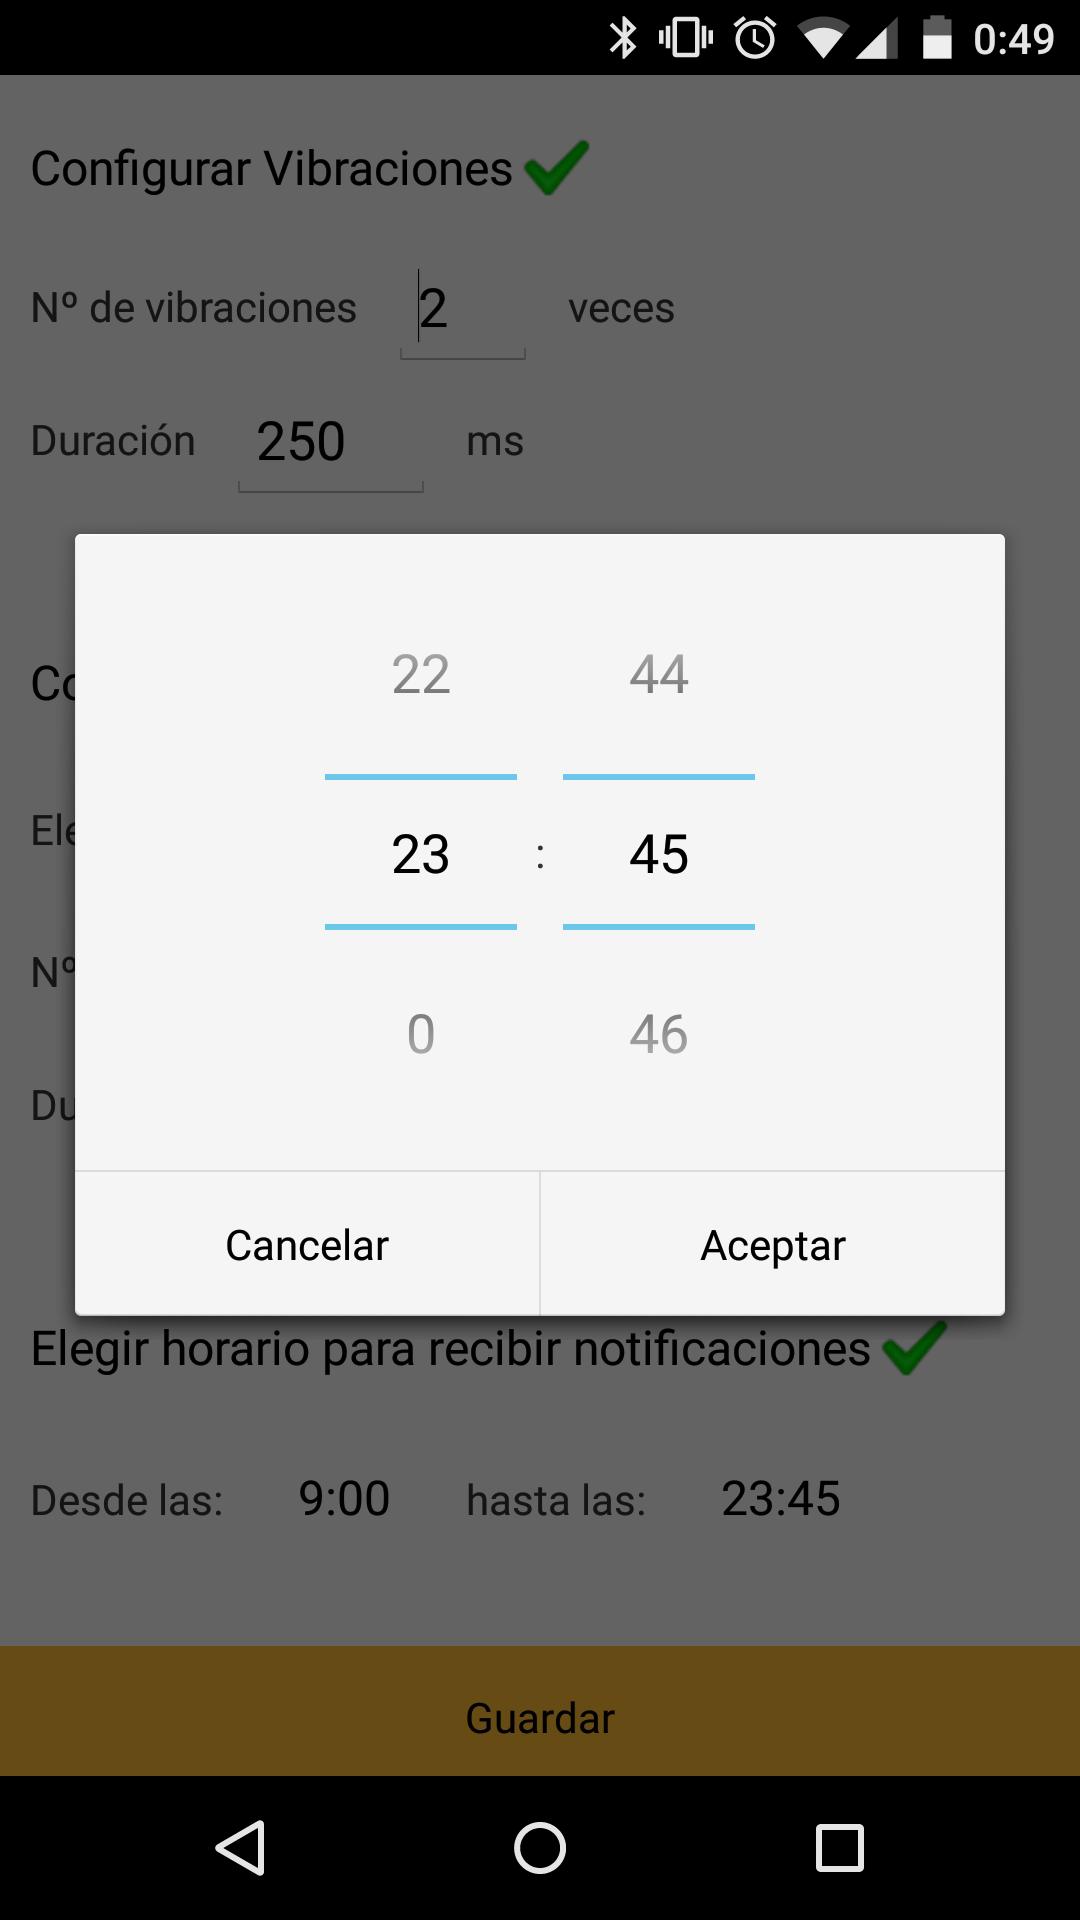 769Screenshot_2015_01_15_.png